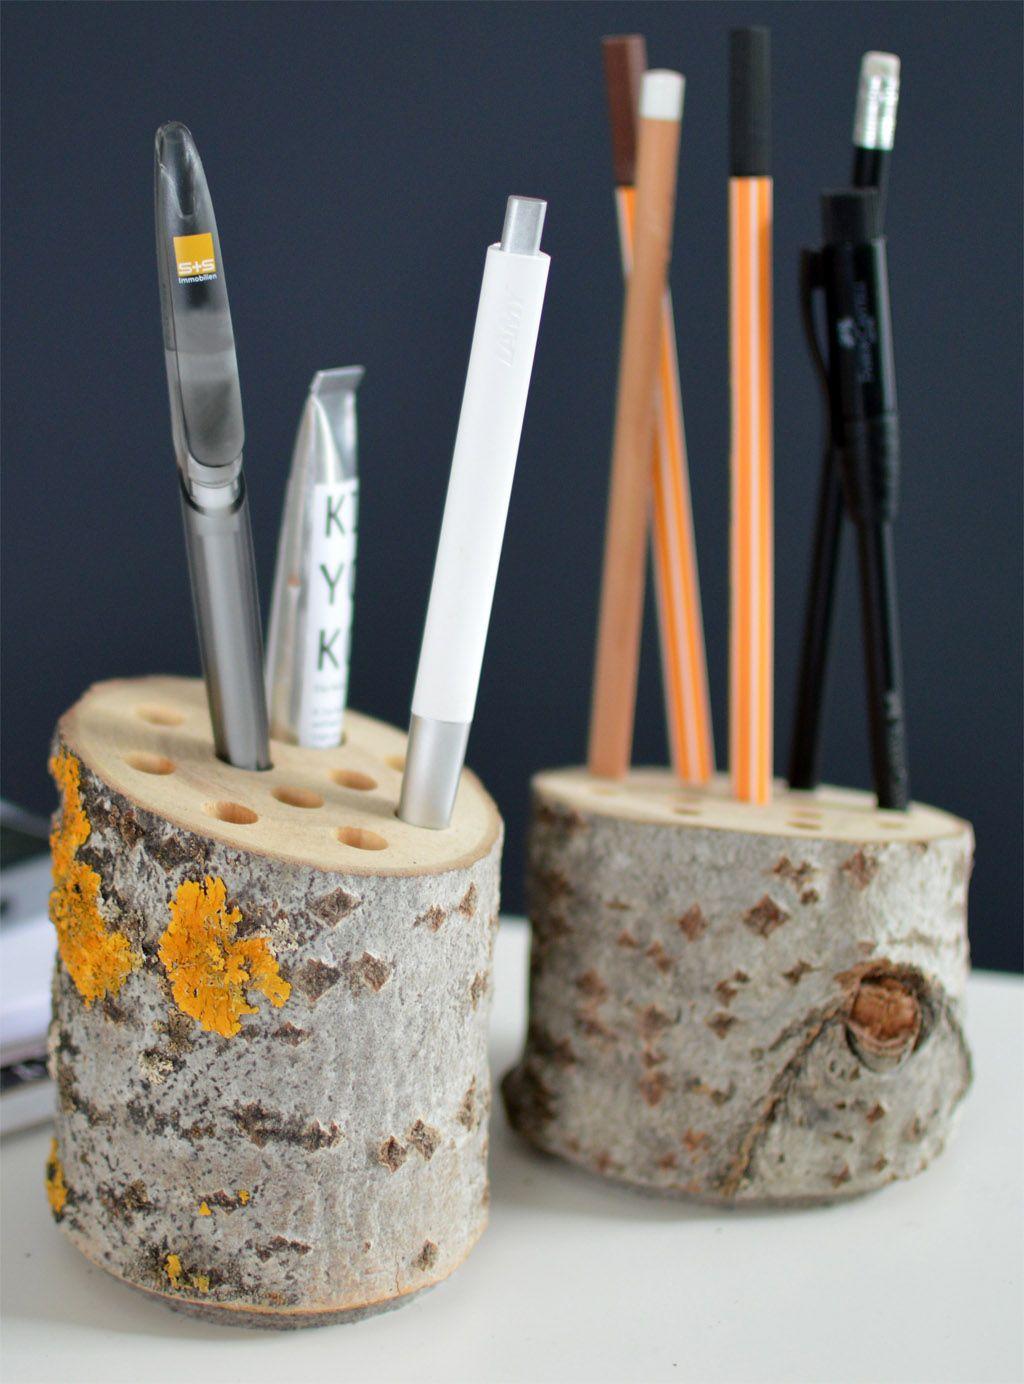 Coole Stiftehalter Aus Holz Selber Machen L DIY Pen Holders Wood Birch